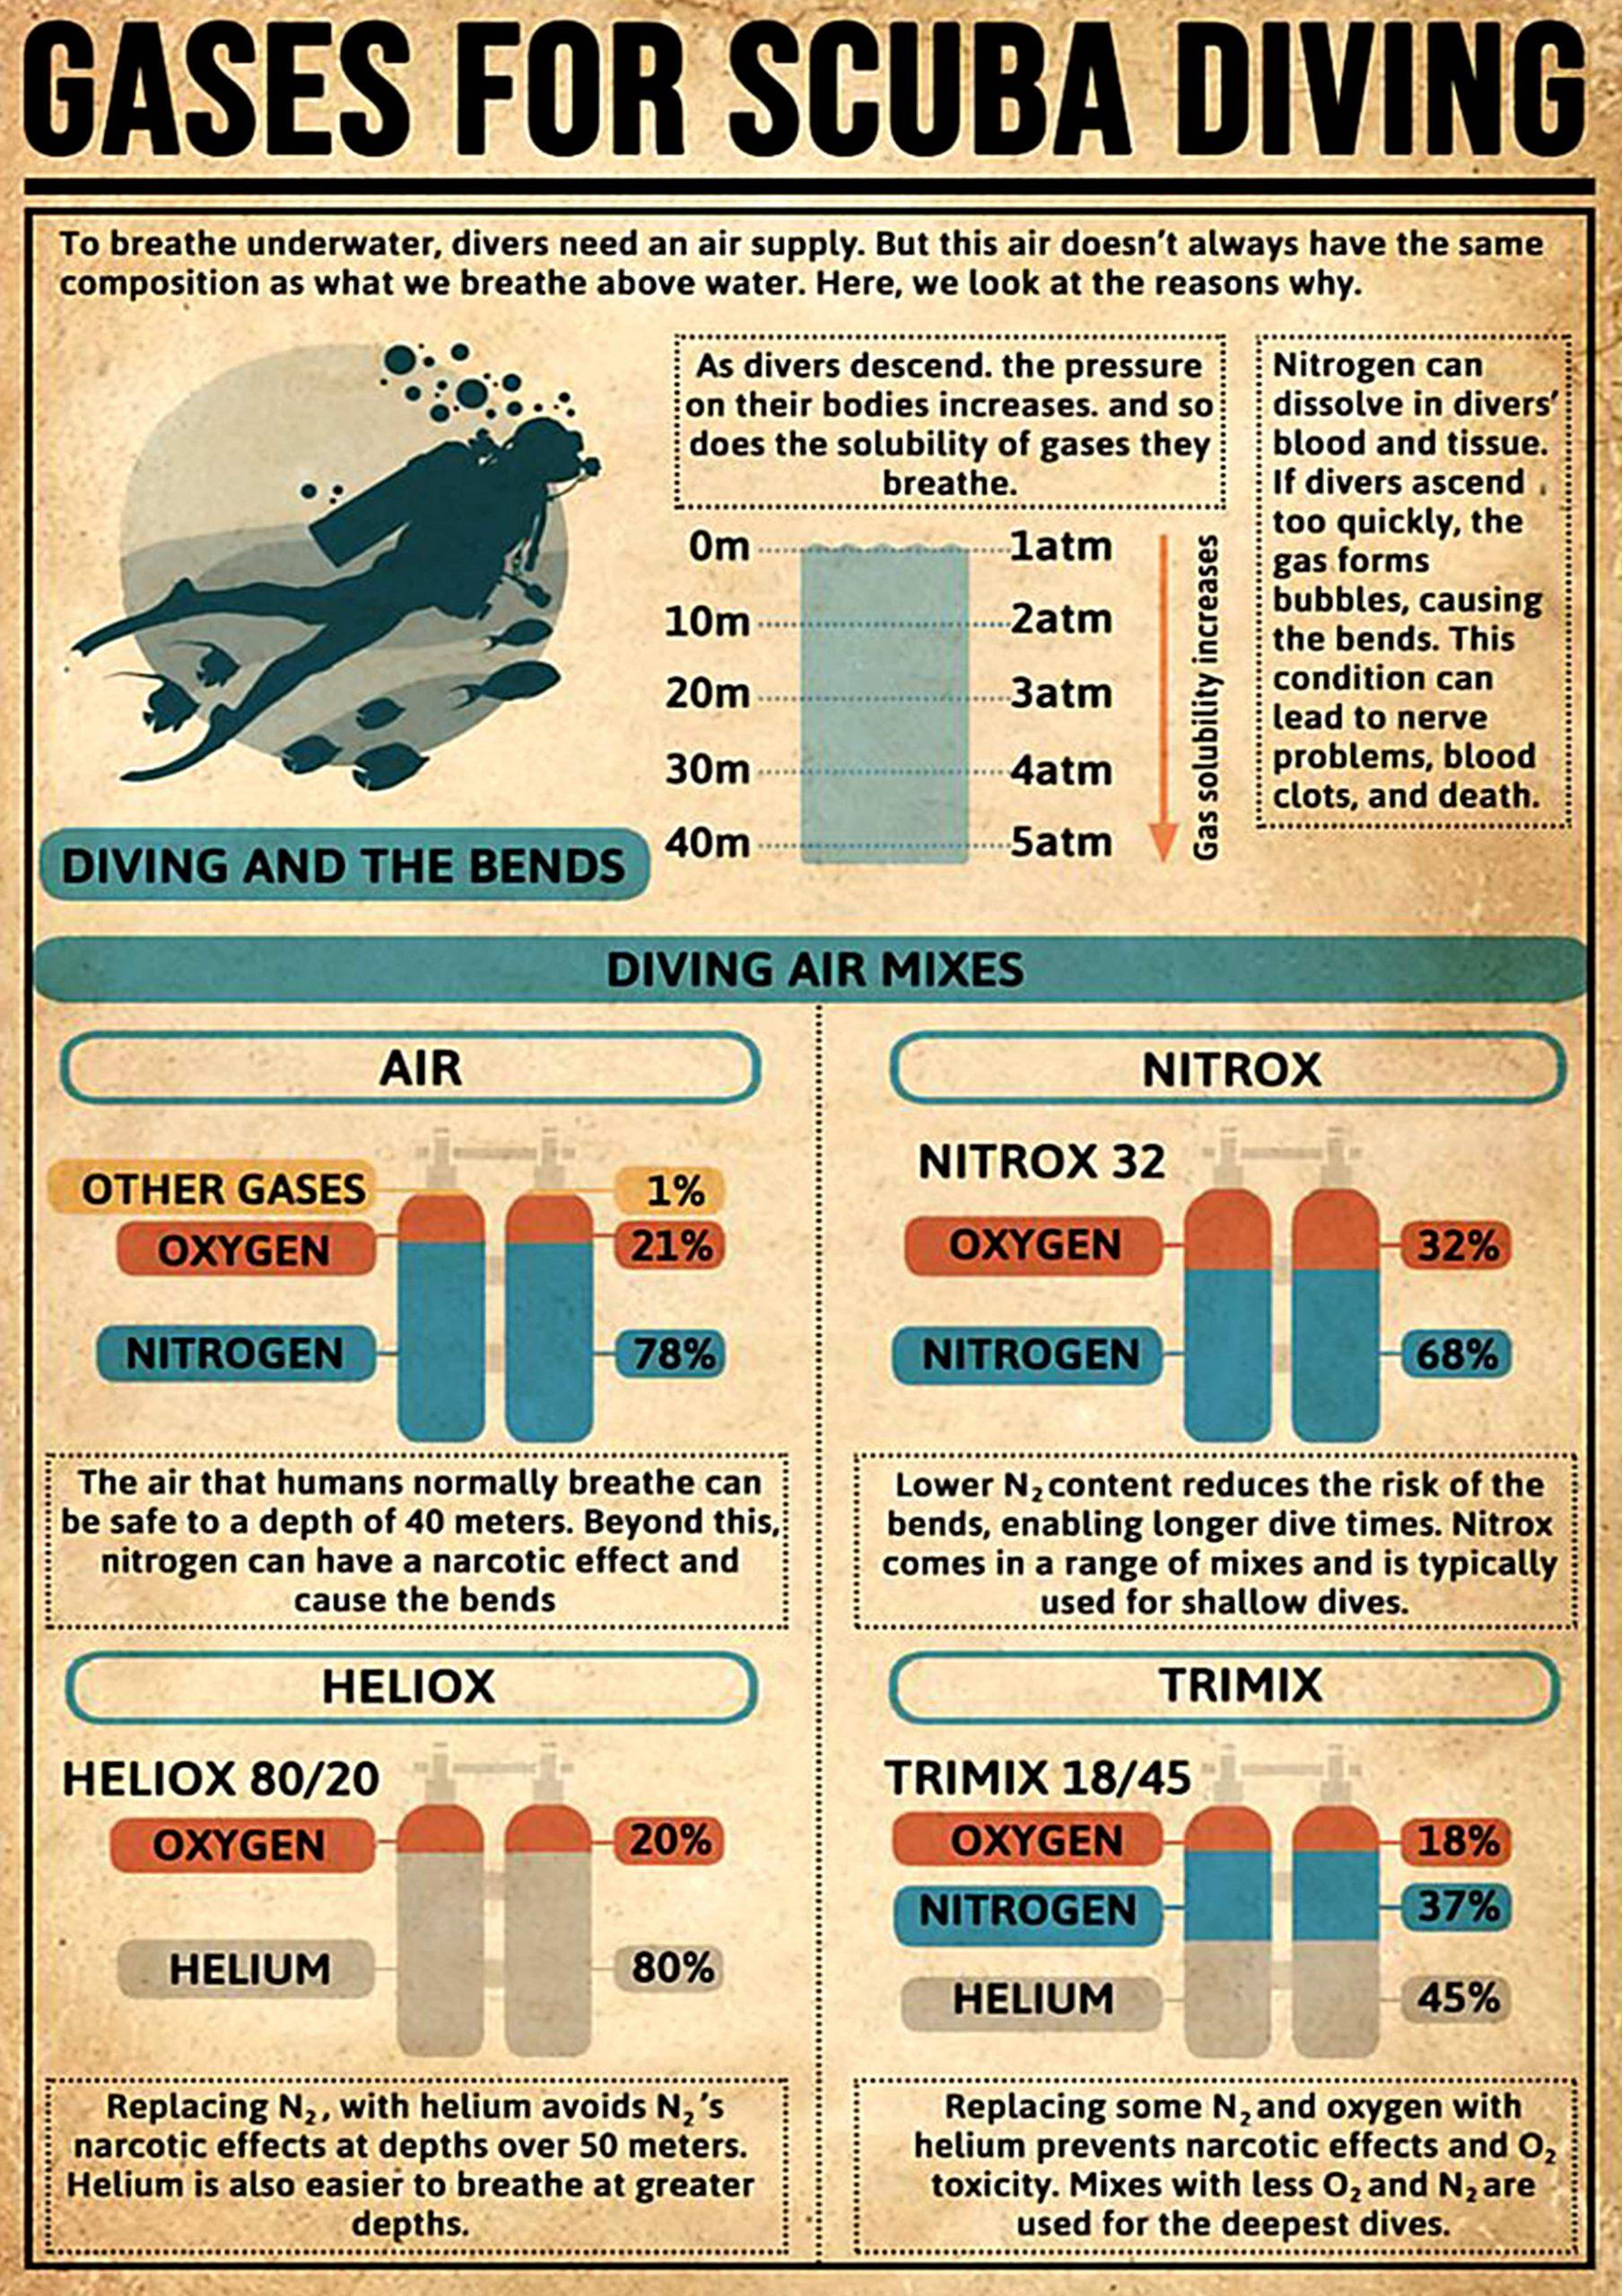 vintage gases for scuba diving poster 1 - Copy (3)